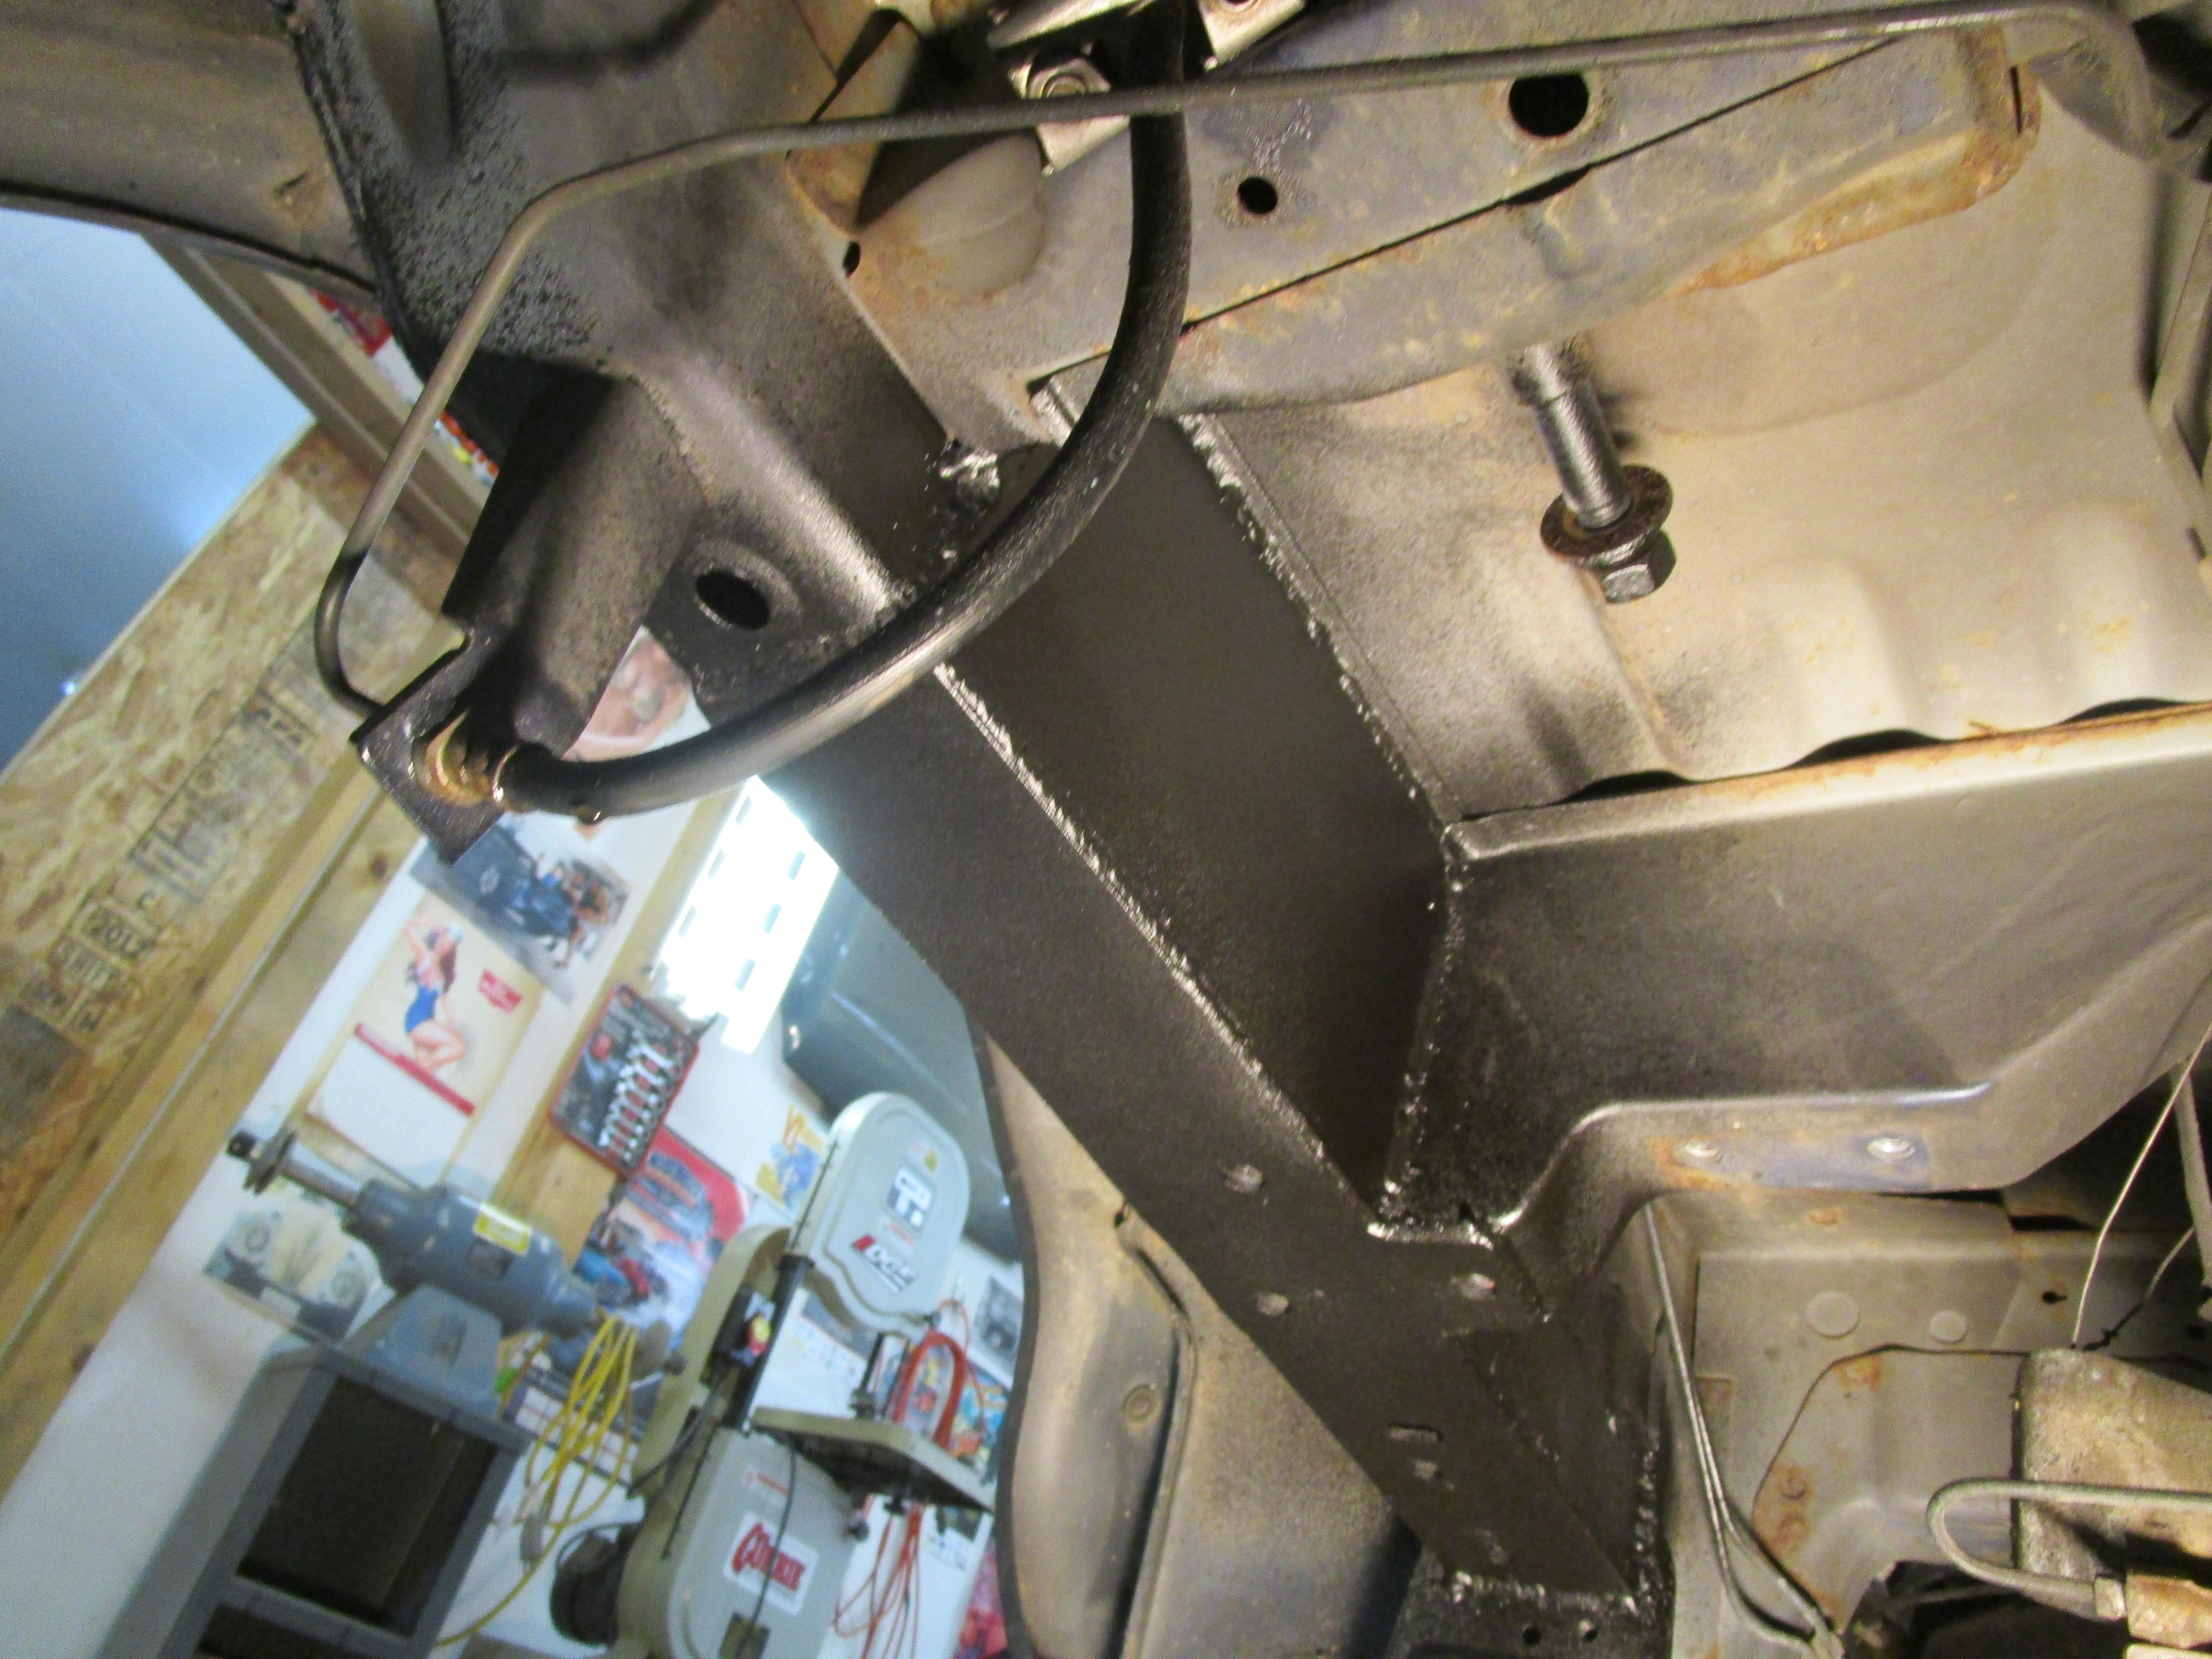 L400 Space Gear Corrosion Repair Scheme Comox Valley